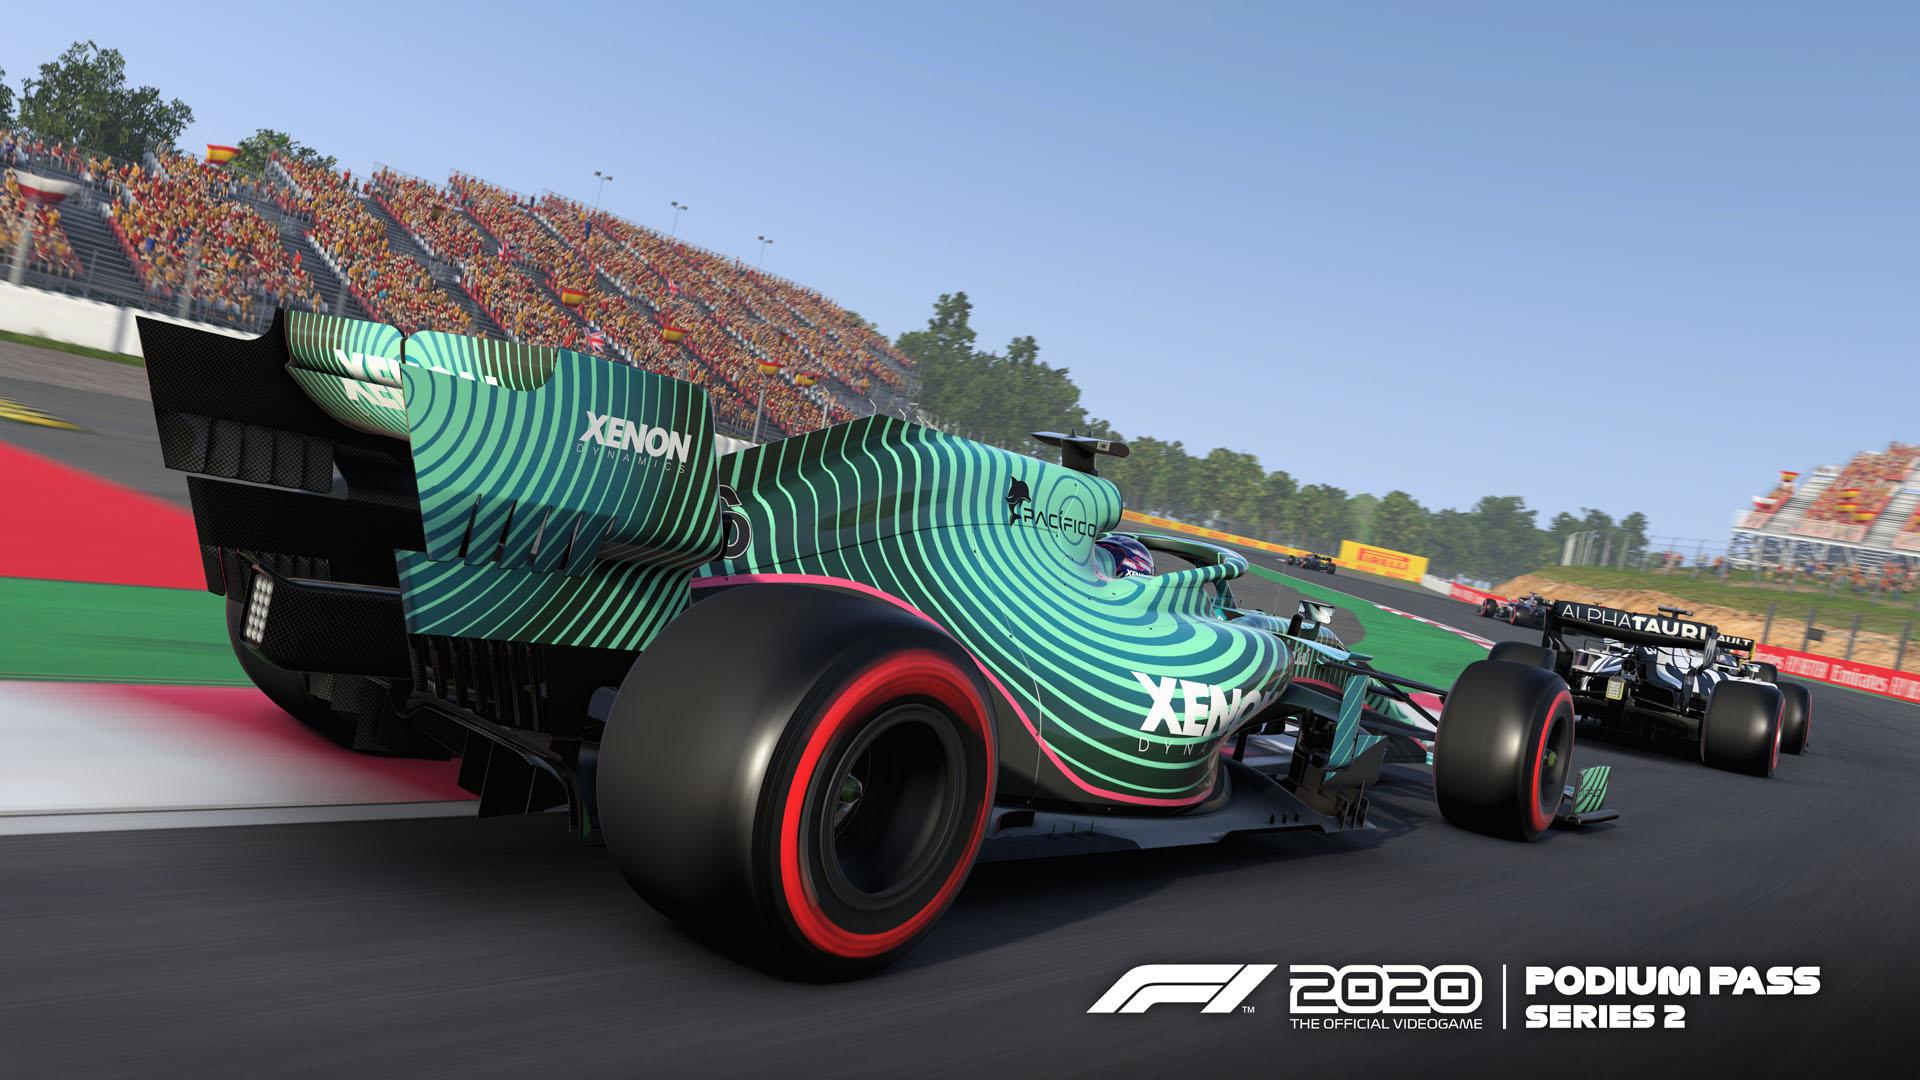 F12020_Podium_Pass_Series2_13_HD